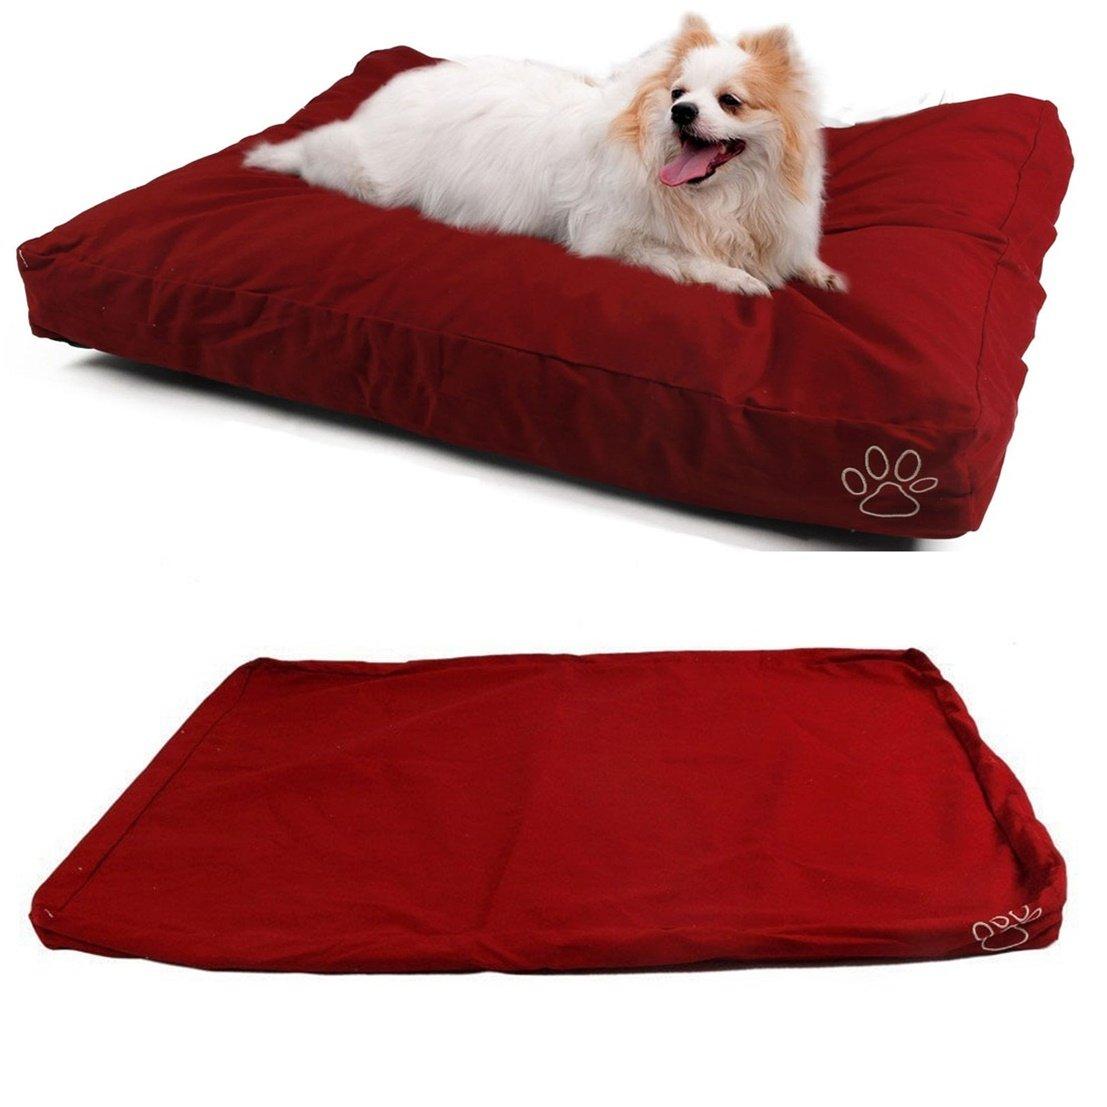 1Pcs Topnotch Popular Pet Bed Cover Size L 36'' x 29'' Replacement Cat Pillow Cushion Color Type Red Cotton